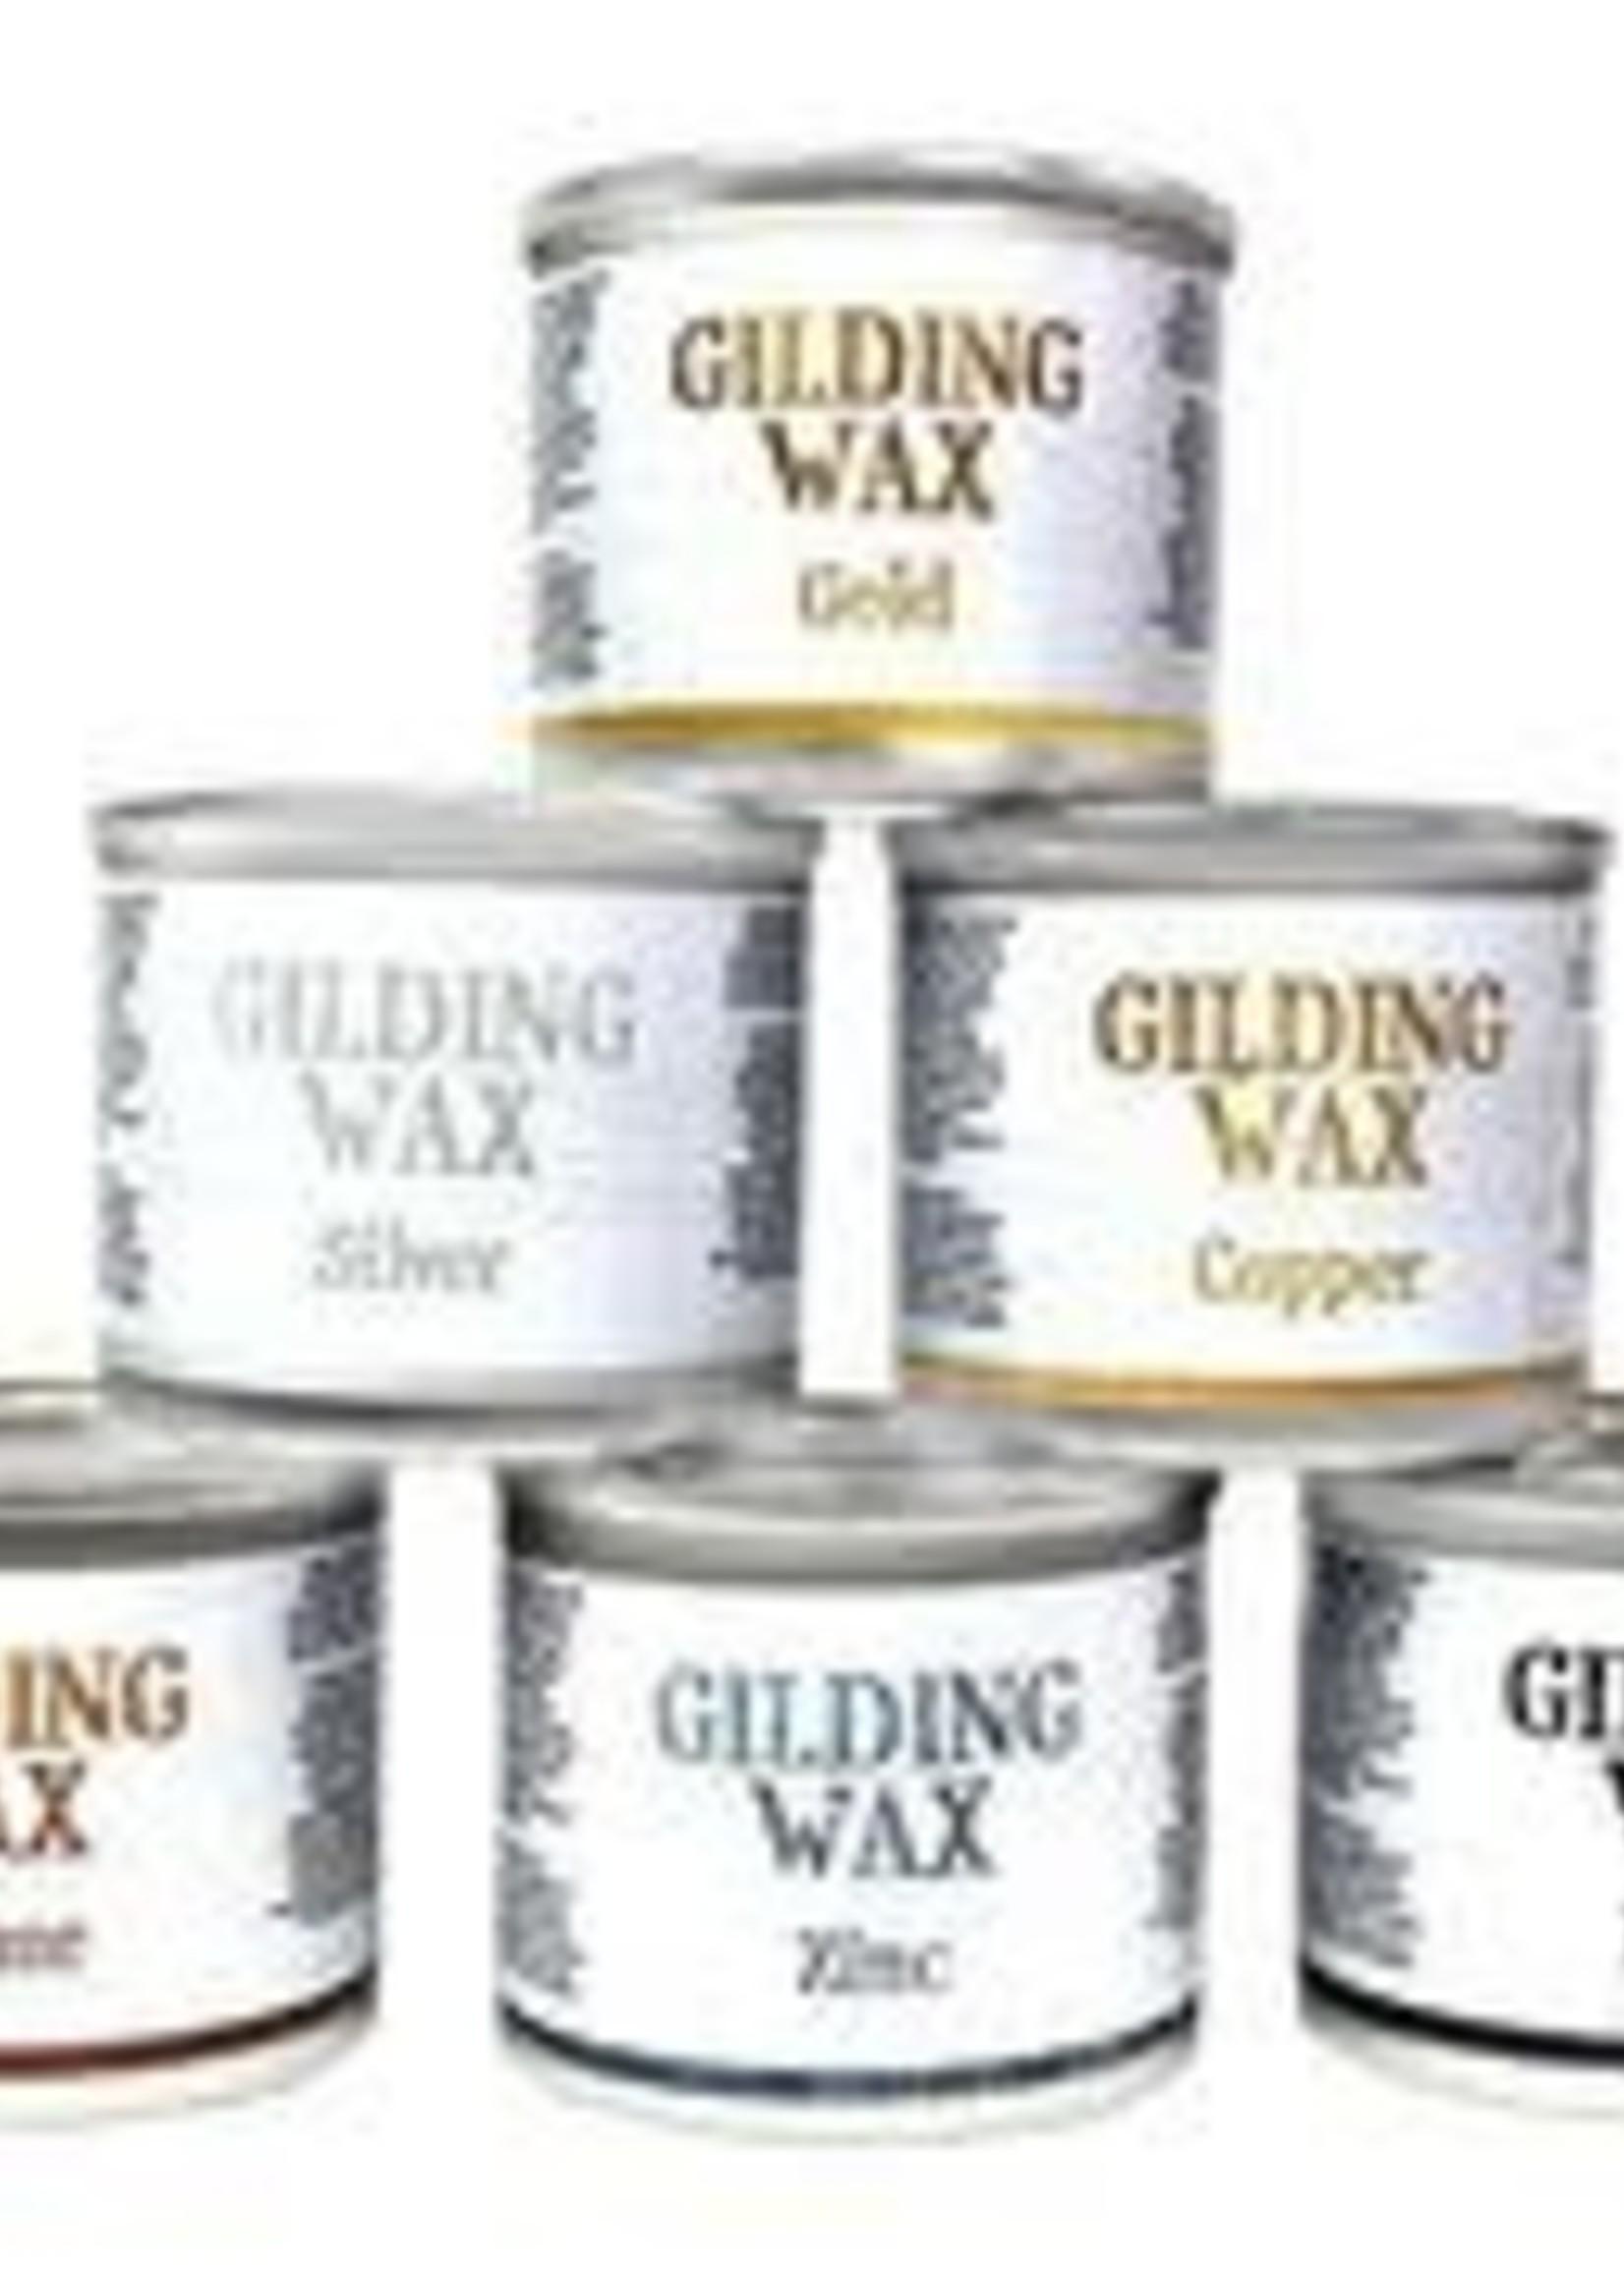 Gilding Wax Black 40 ml